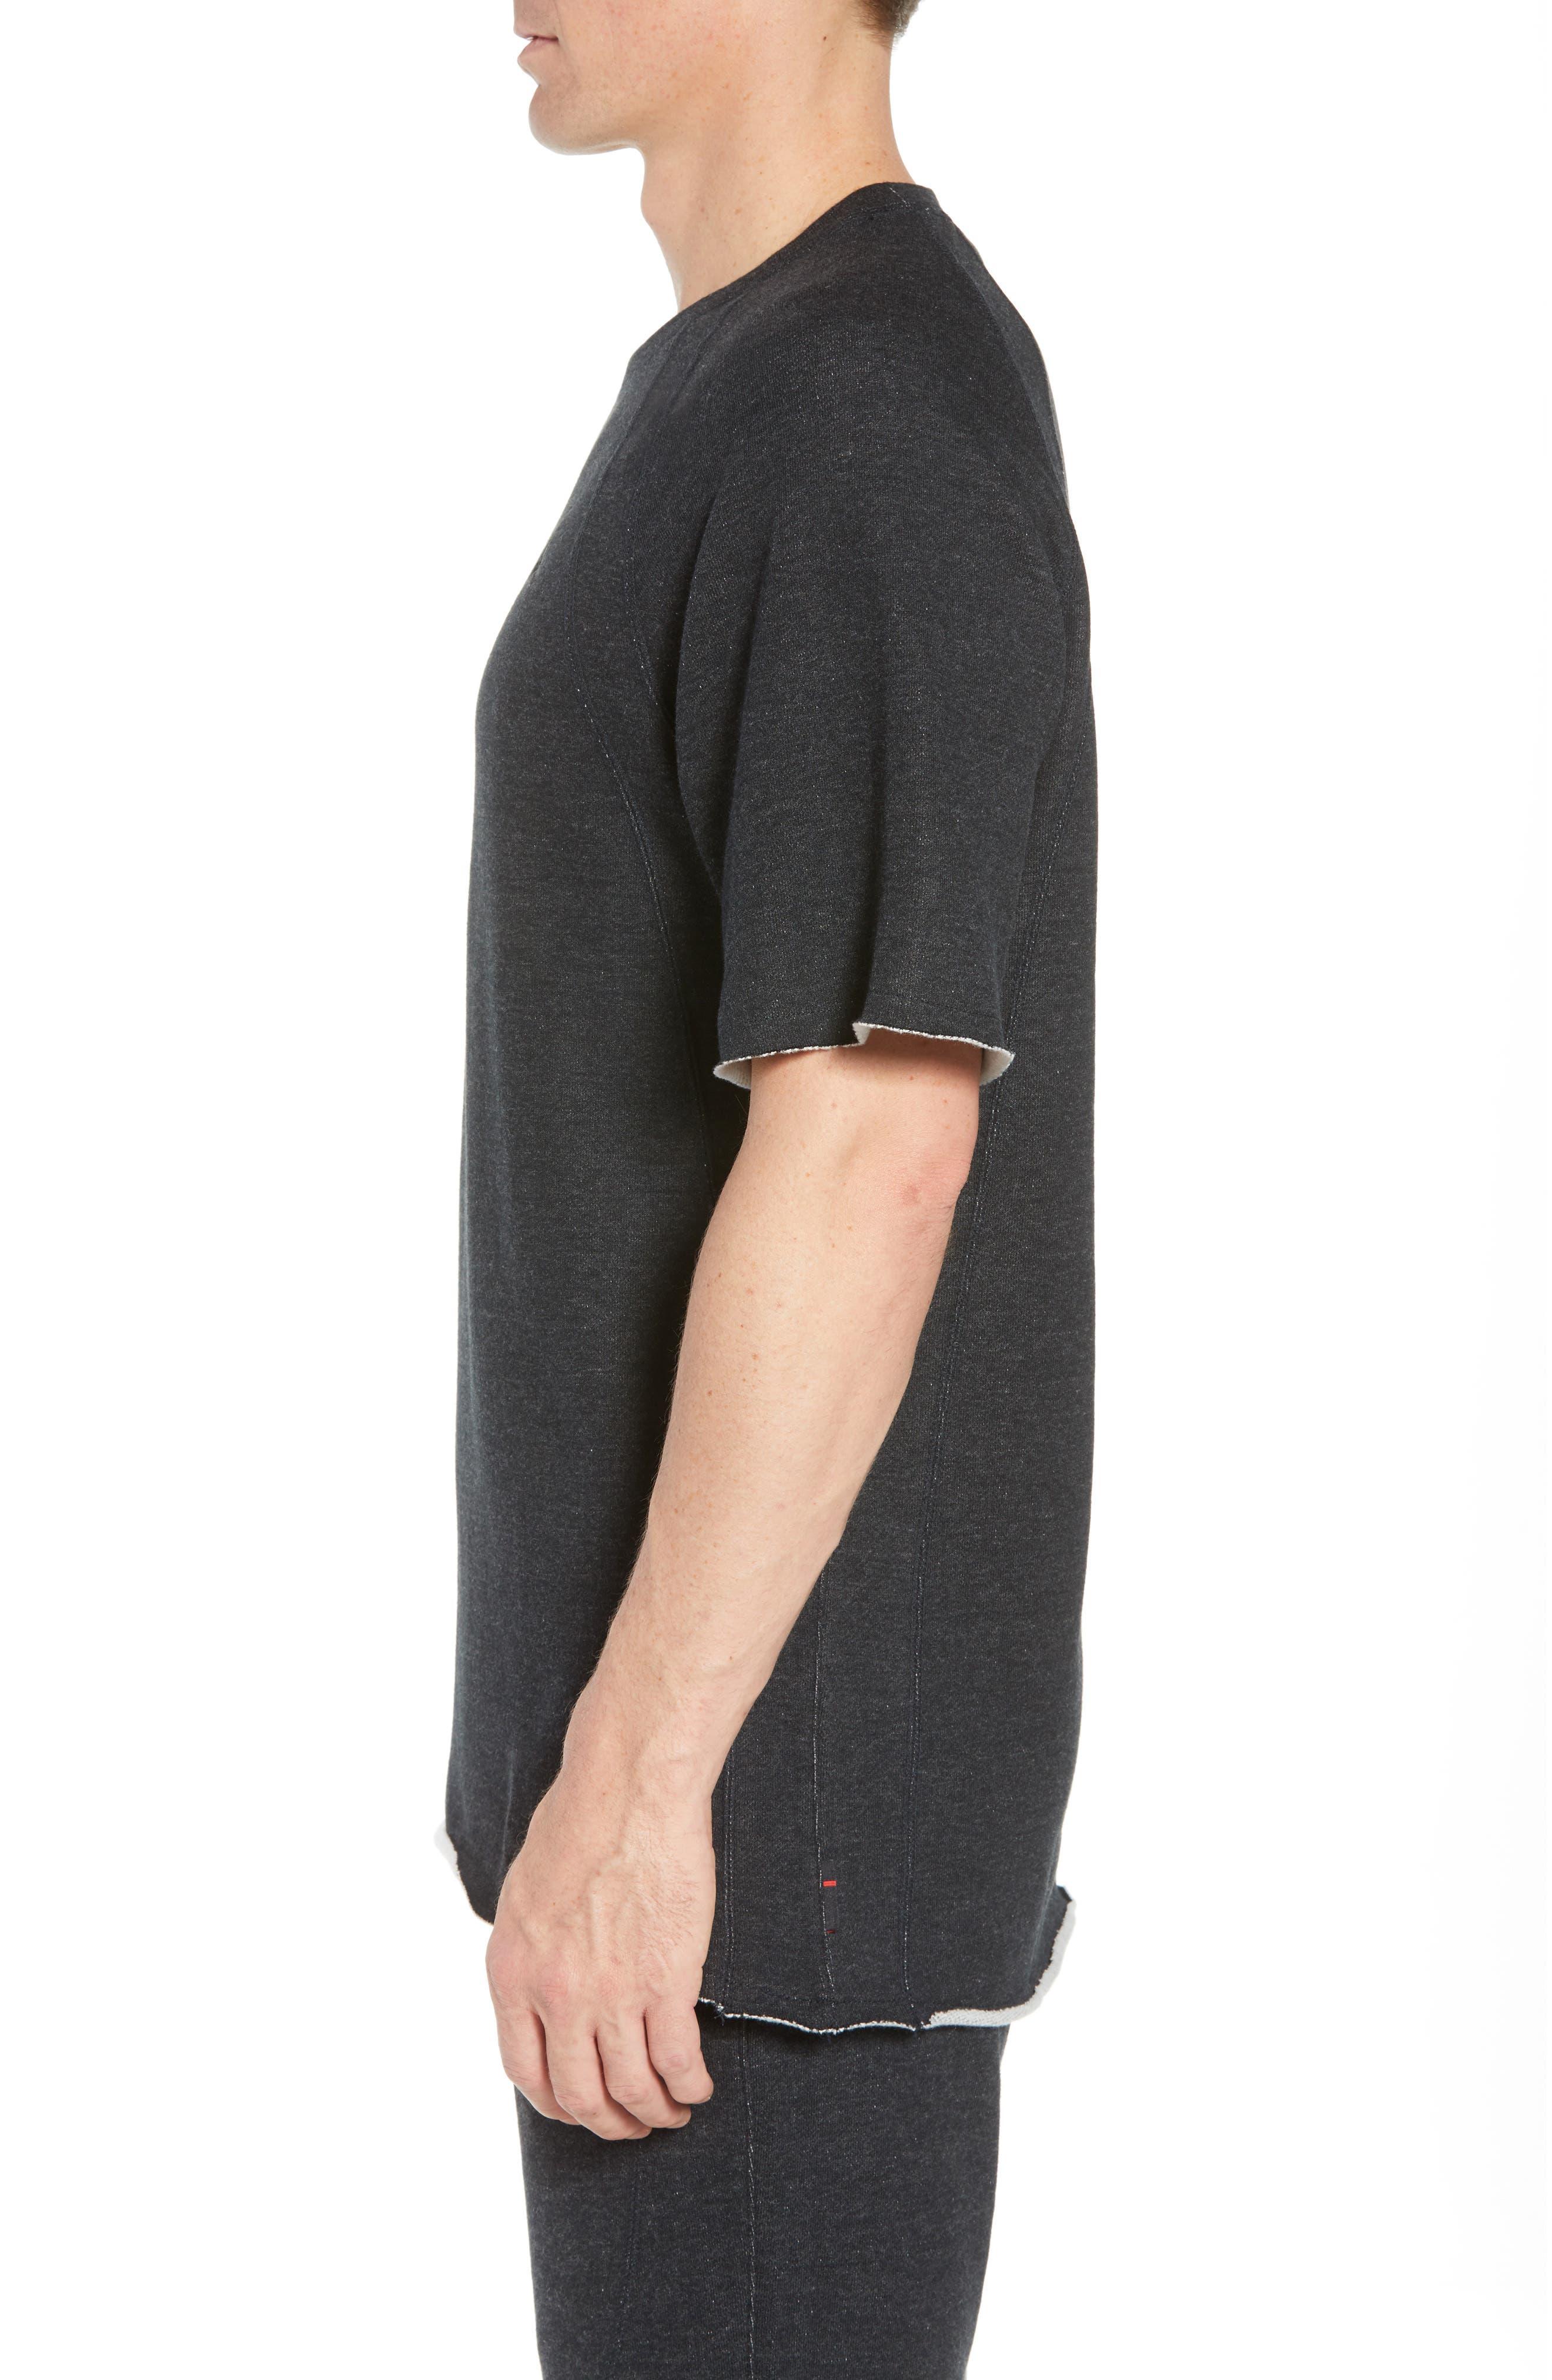 Wings Light Short Sleeve Sweatshirt,                             Alternate thumbnail 3, color,                             BLACK HEATHER/ BLACK